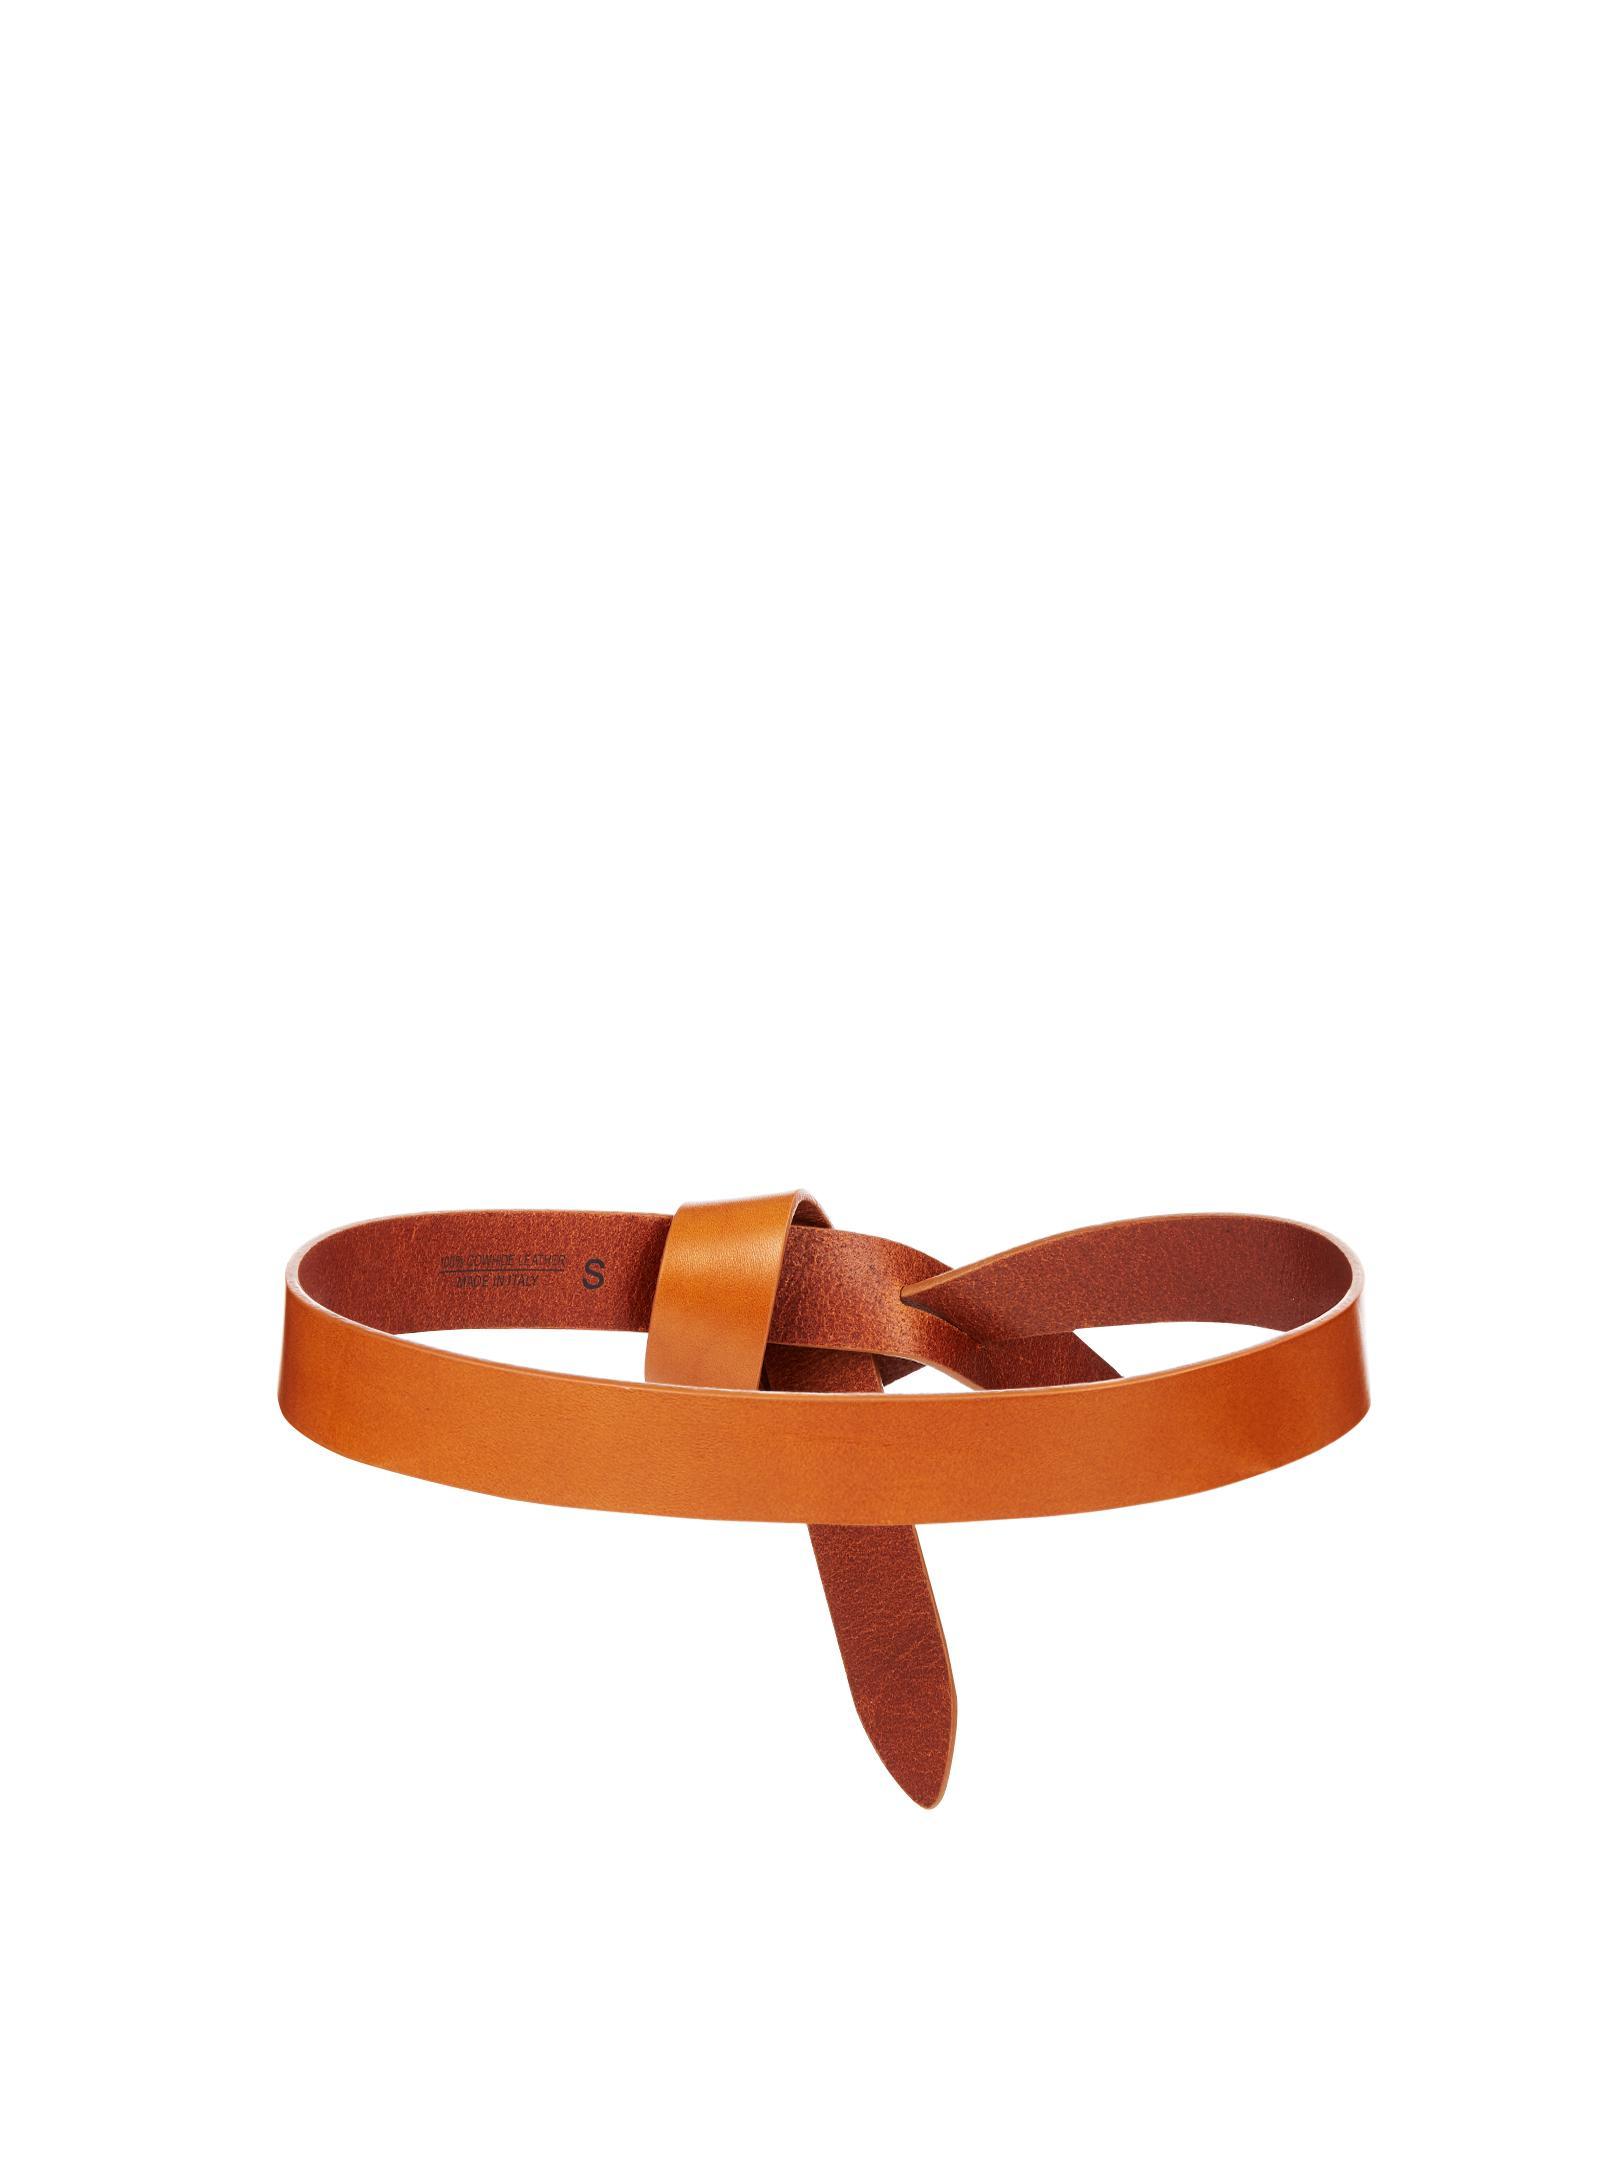 7bb05f43db0 Étoile Isabel Marant Multicolor Lecce Leather Knot Waist Belt